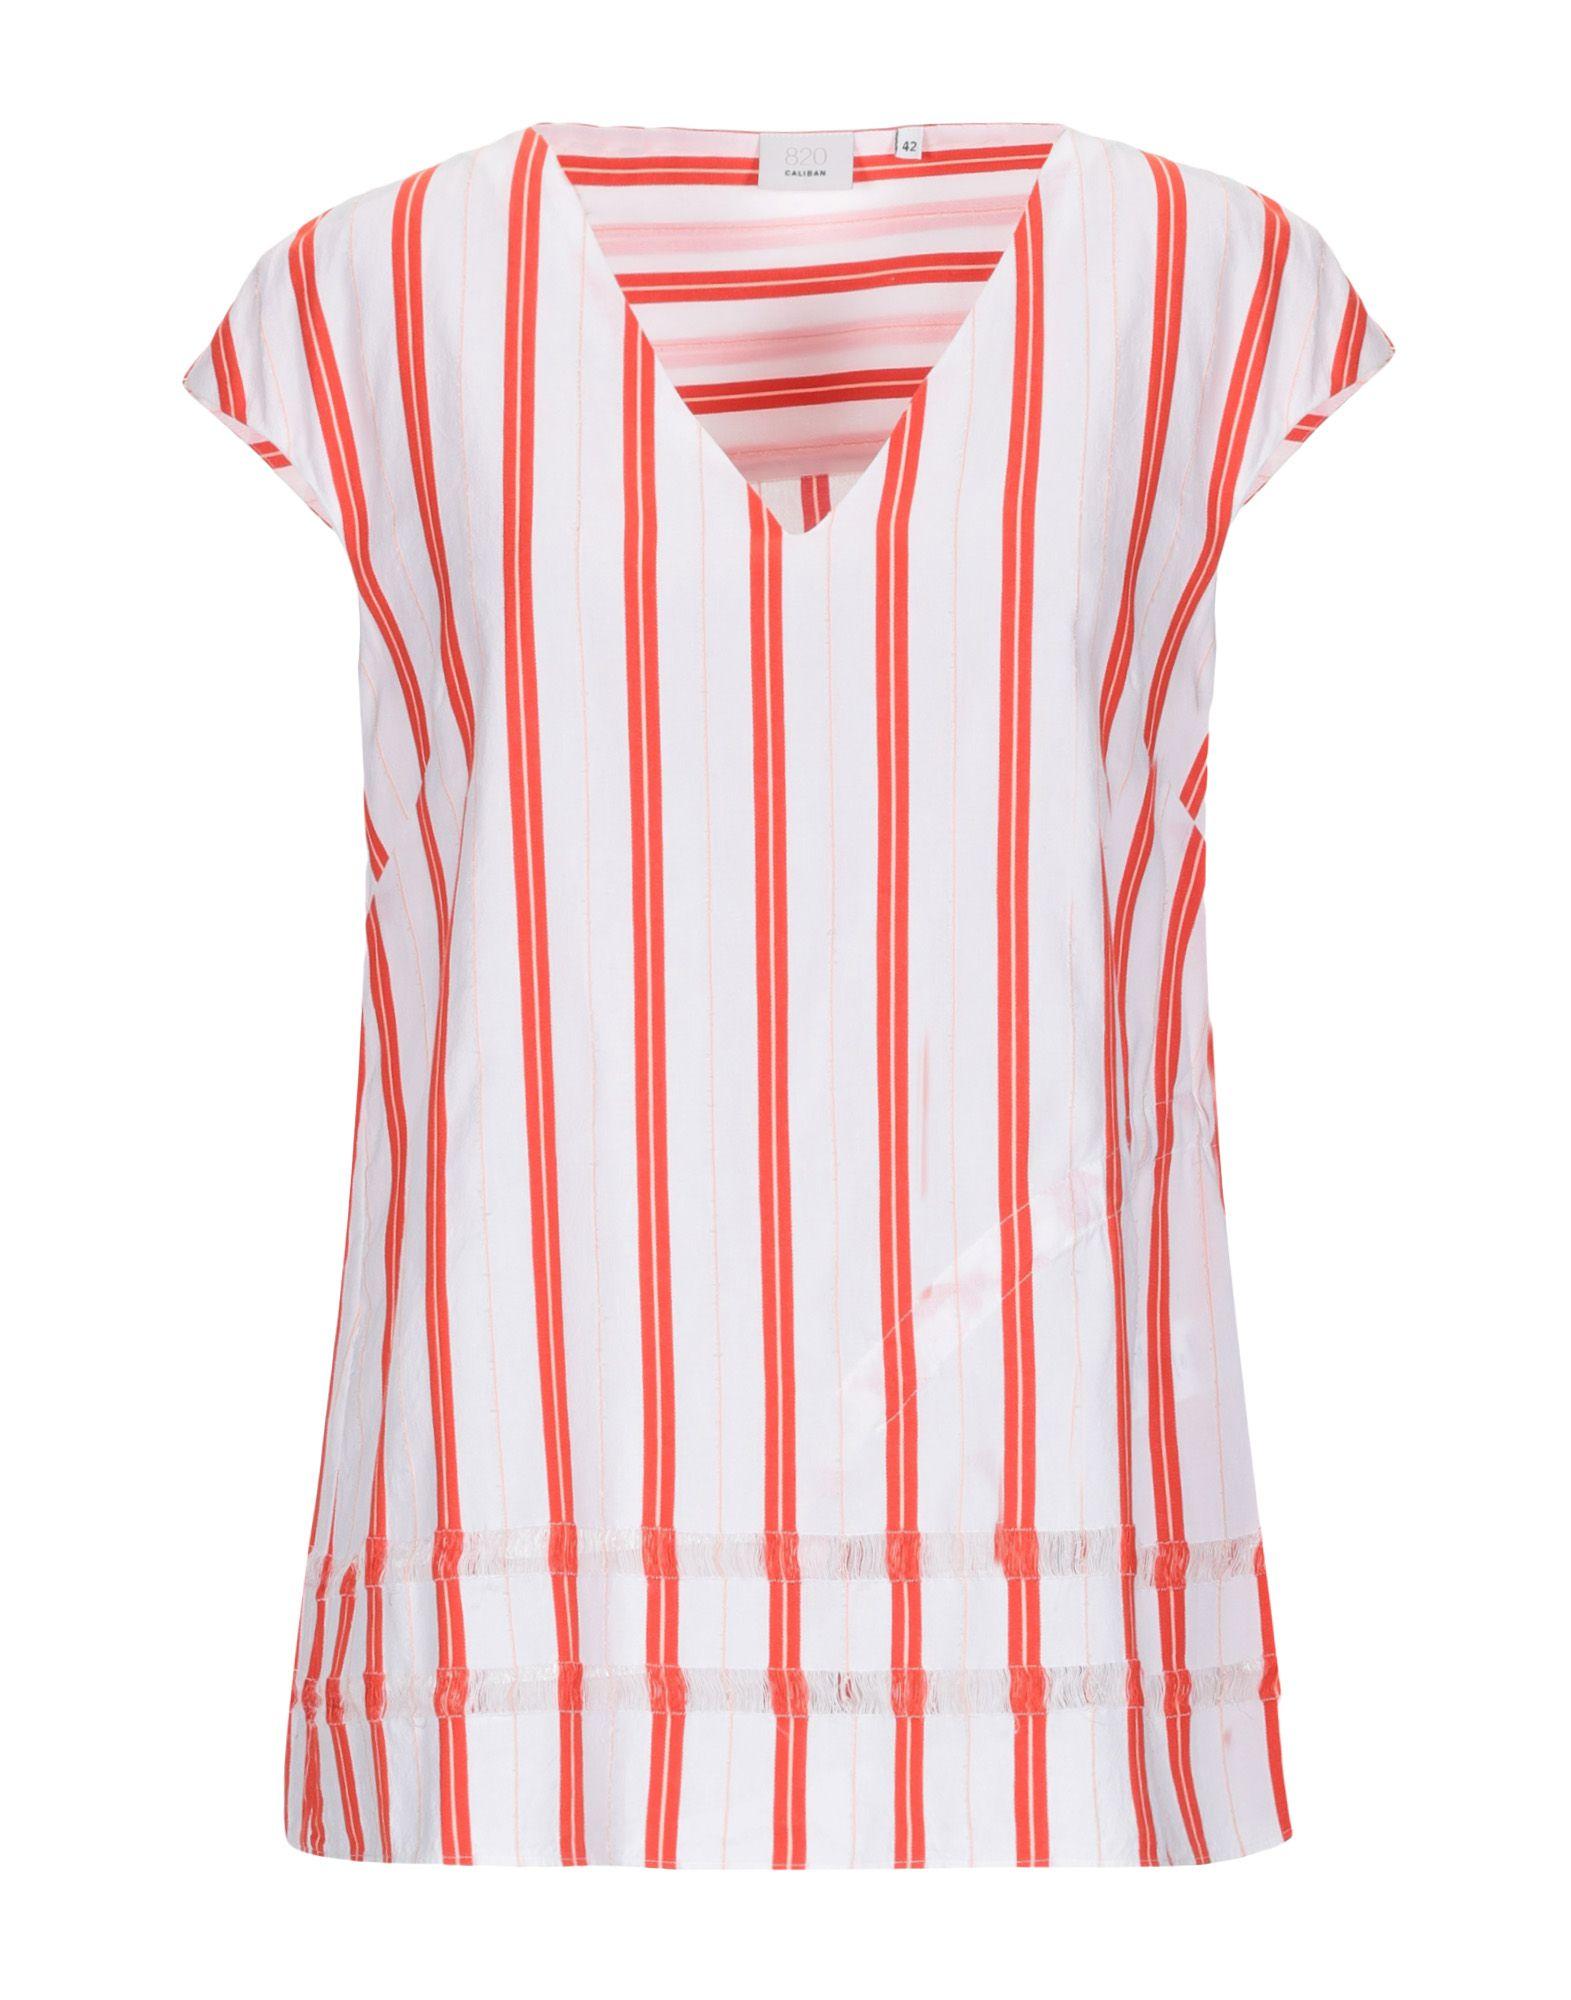 CALIBAN Блузка блузка в полоску marice